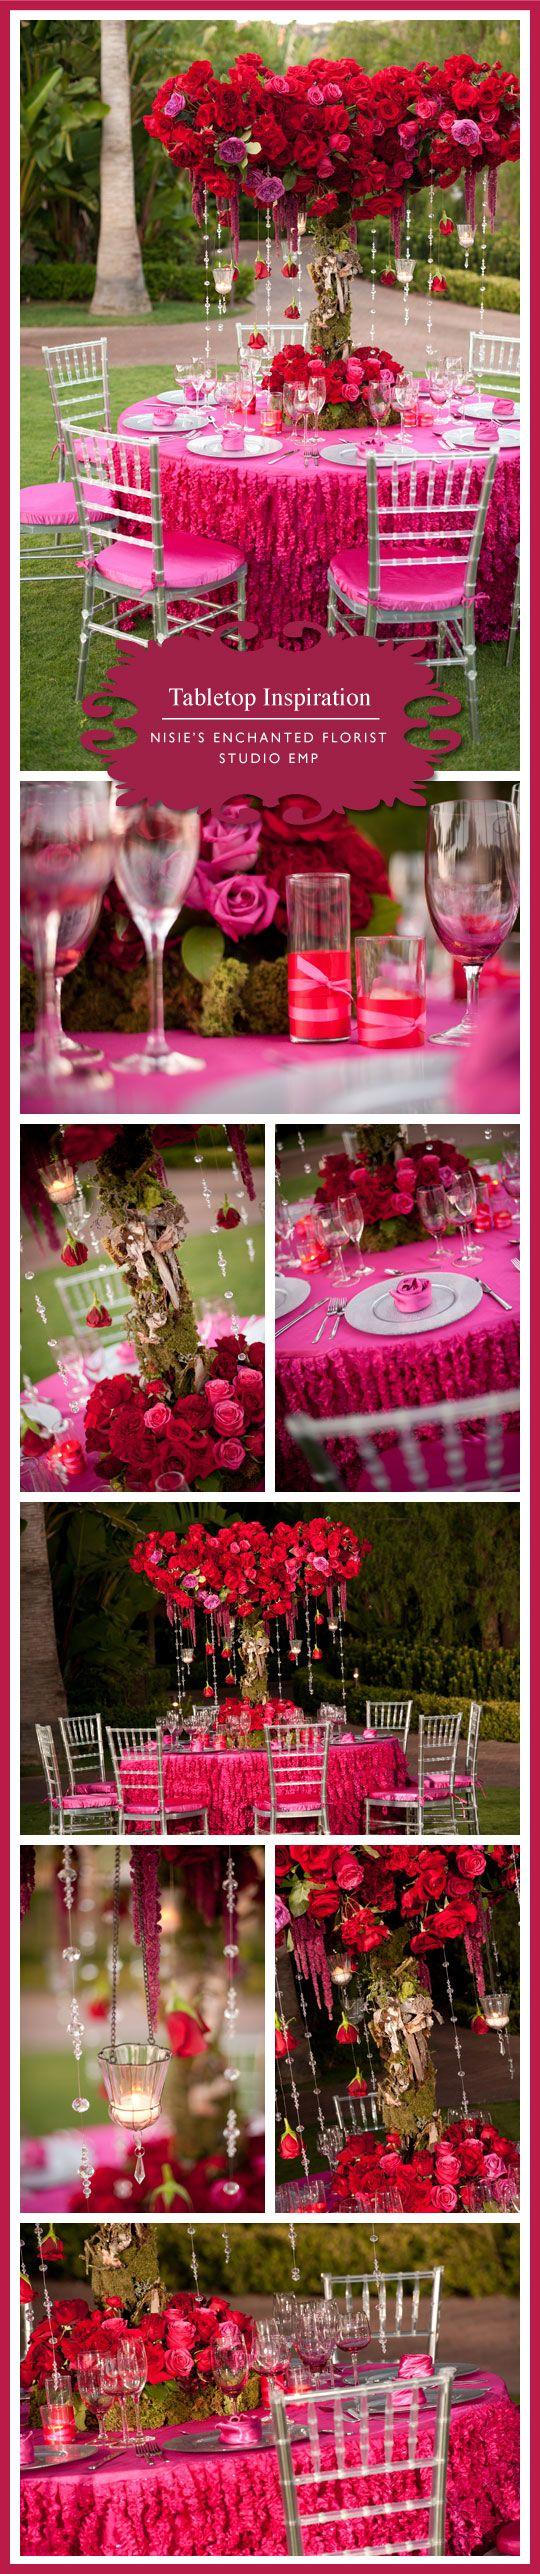 {Floral Design} Nisie's Enchanted Florist  {Linens} Wildflower Linen  {Rentals} Classic Party Rentals  {Chairs} Unique Tabletop Rentals  {Location} The Resort at Pelican Hill, Newport Beach  {Photography} Studio EMP